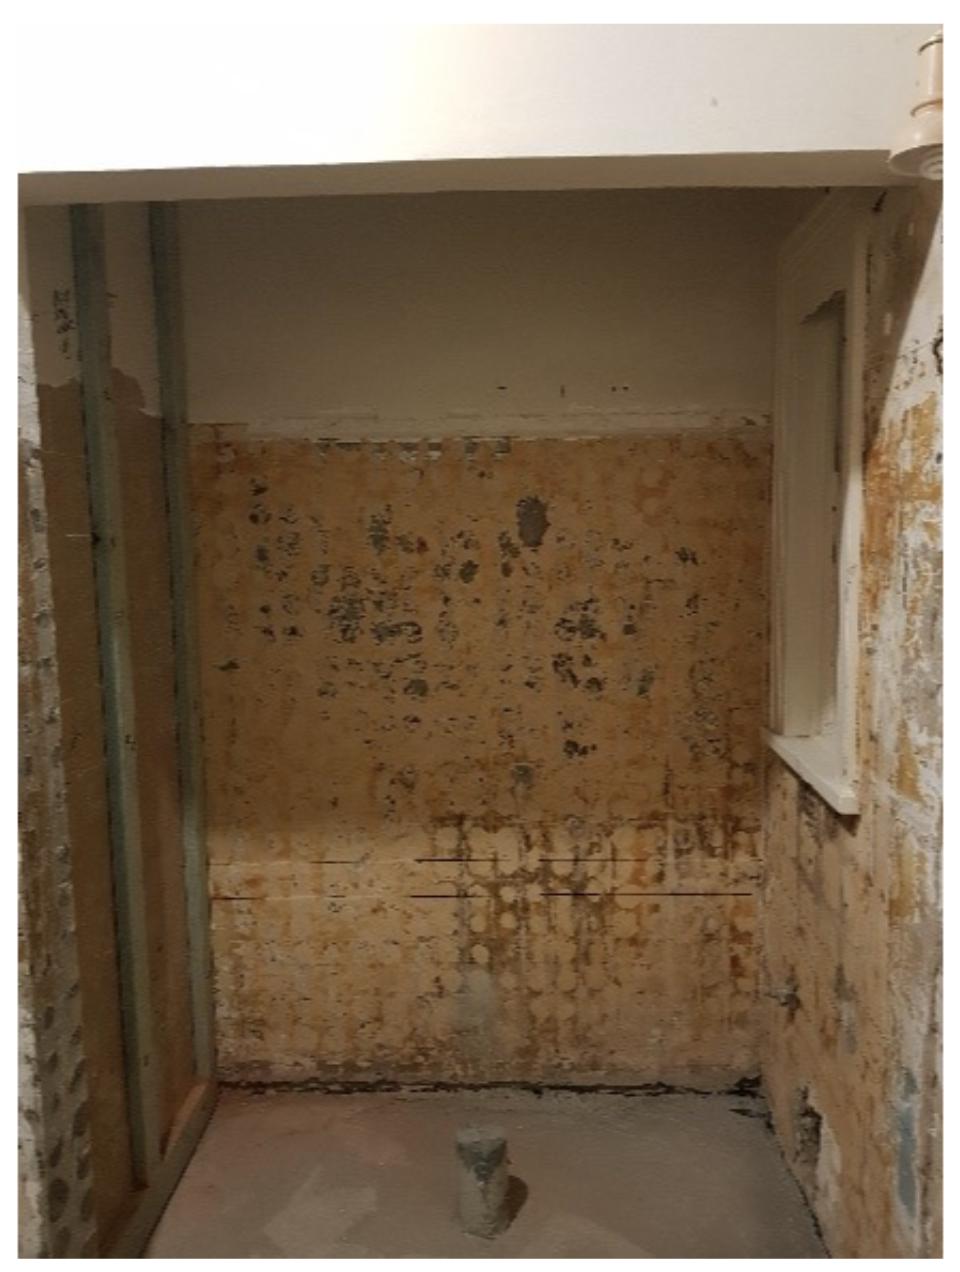 journey-home-interiors-forrest-demolition-1930s-bathroom-remodel-consturction-begins-shower-drain-in-progress